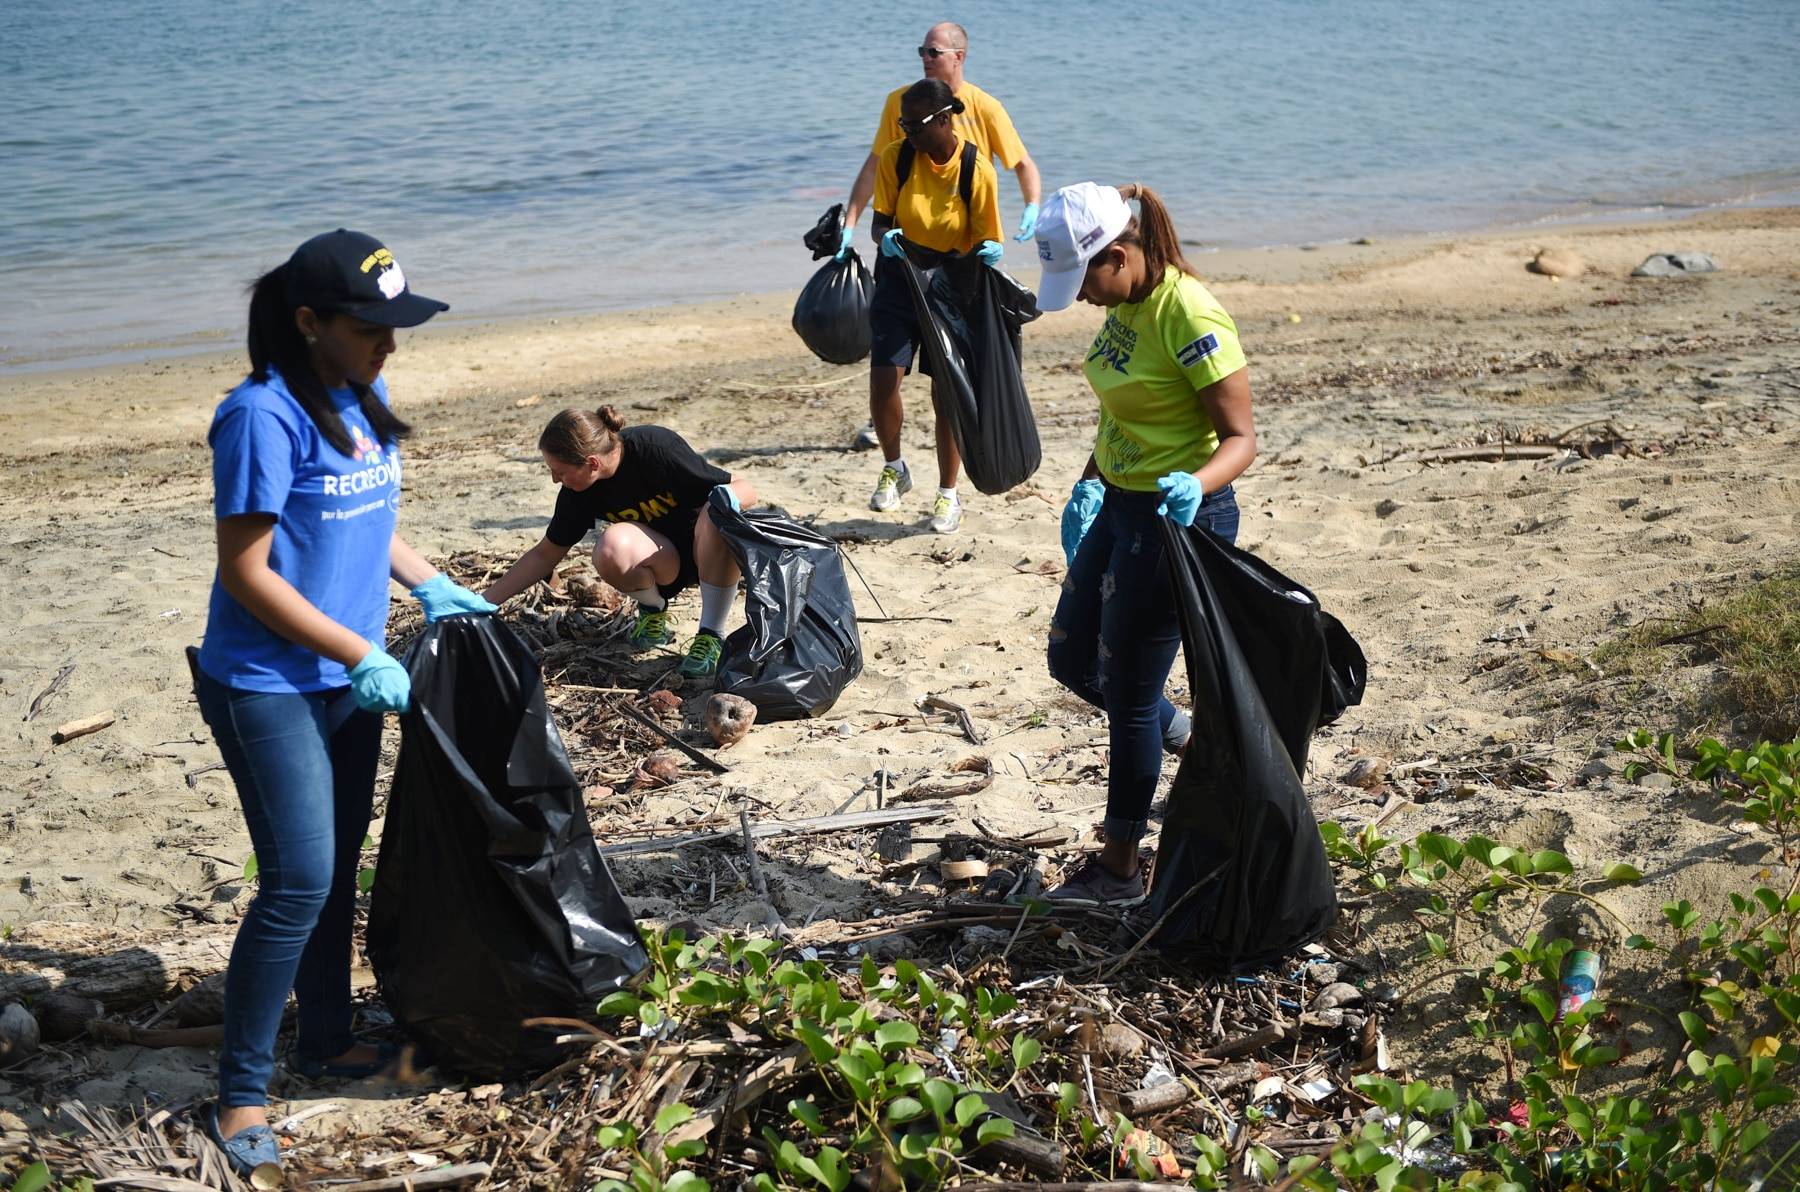 People picking up trash on beach (U.S. Navy/Shamira Purifoy)